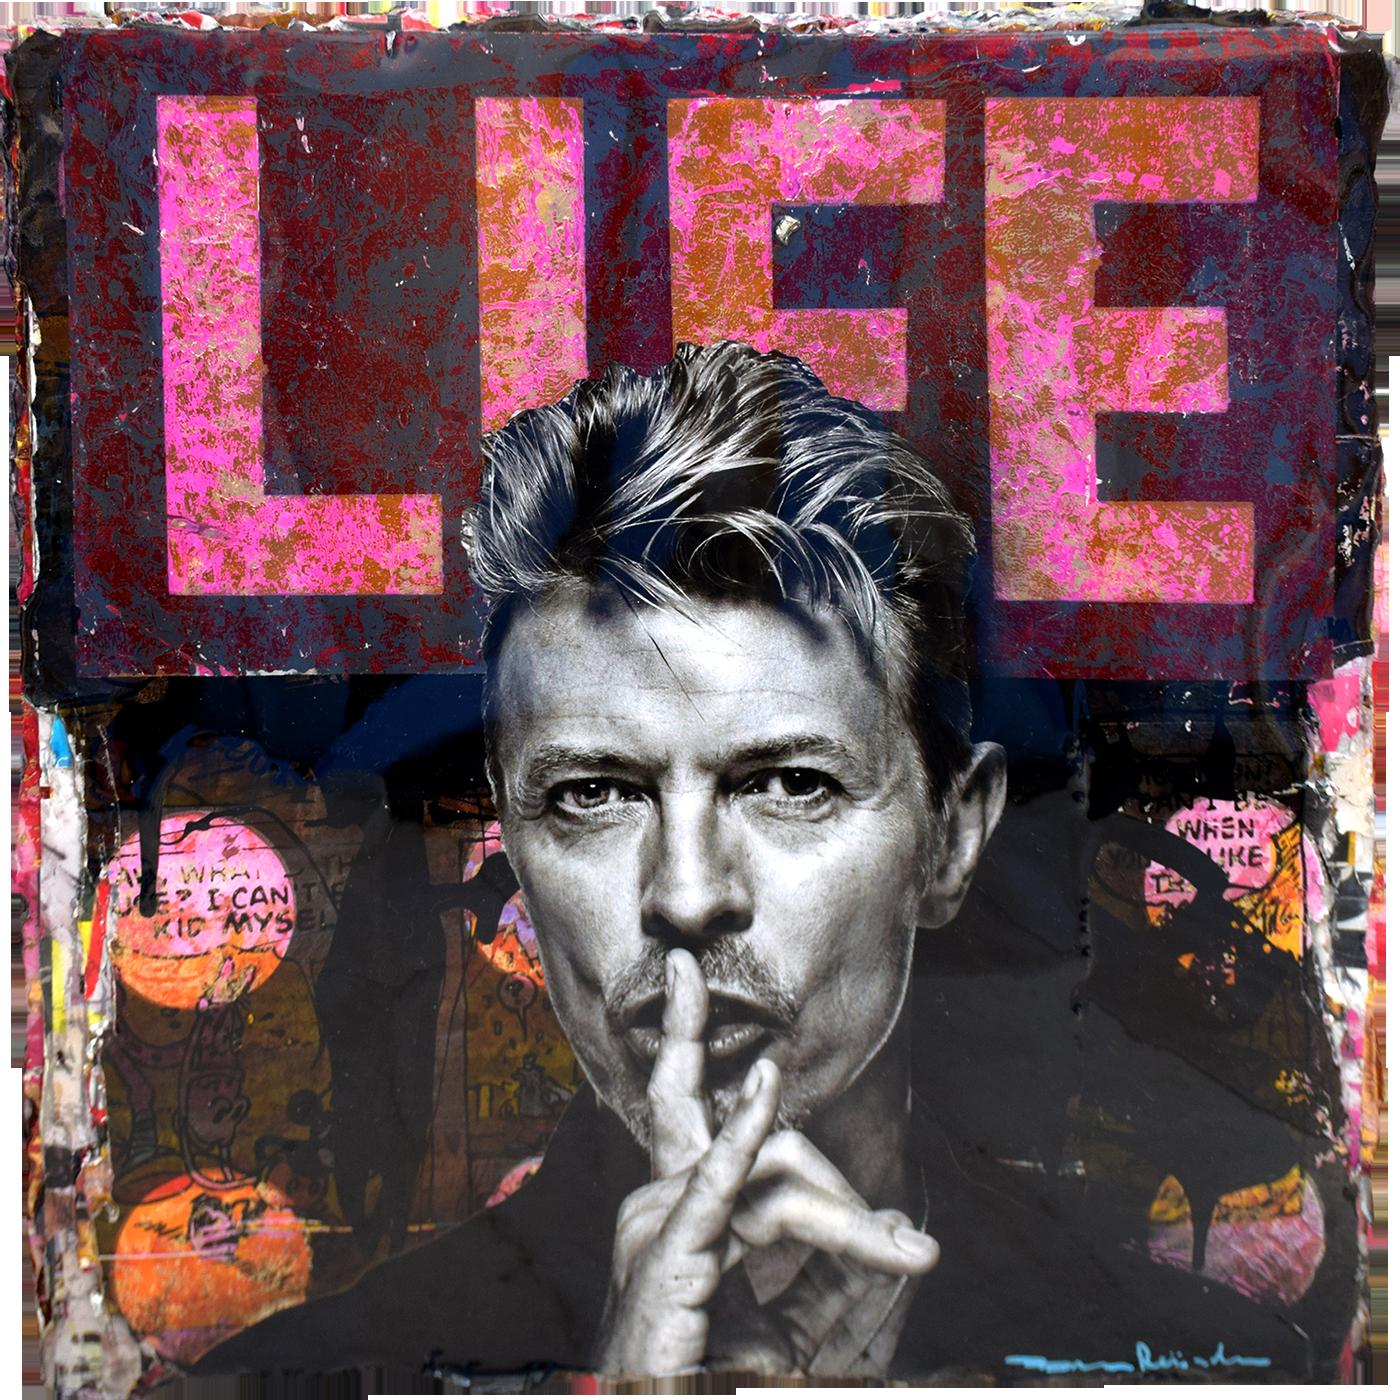 Bram Reijnders - Bowie (LIFE) , 8031-012-096